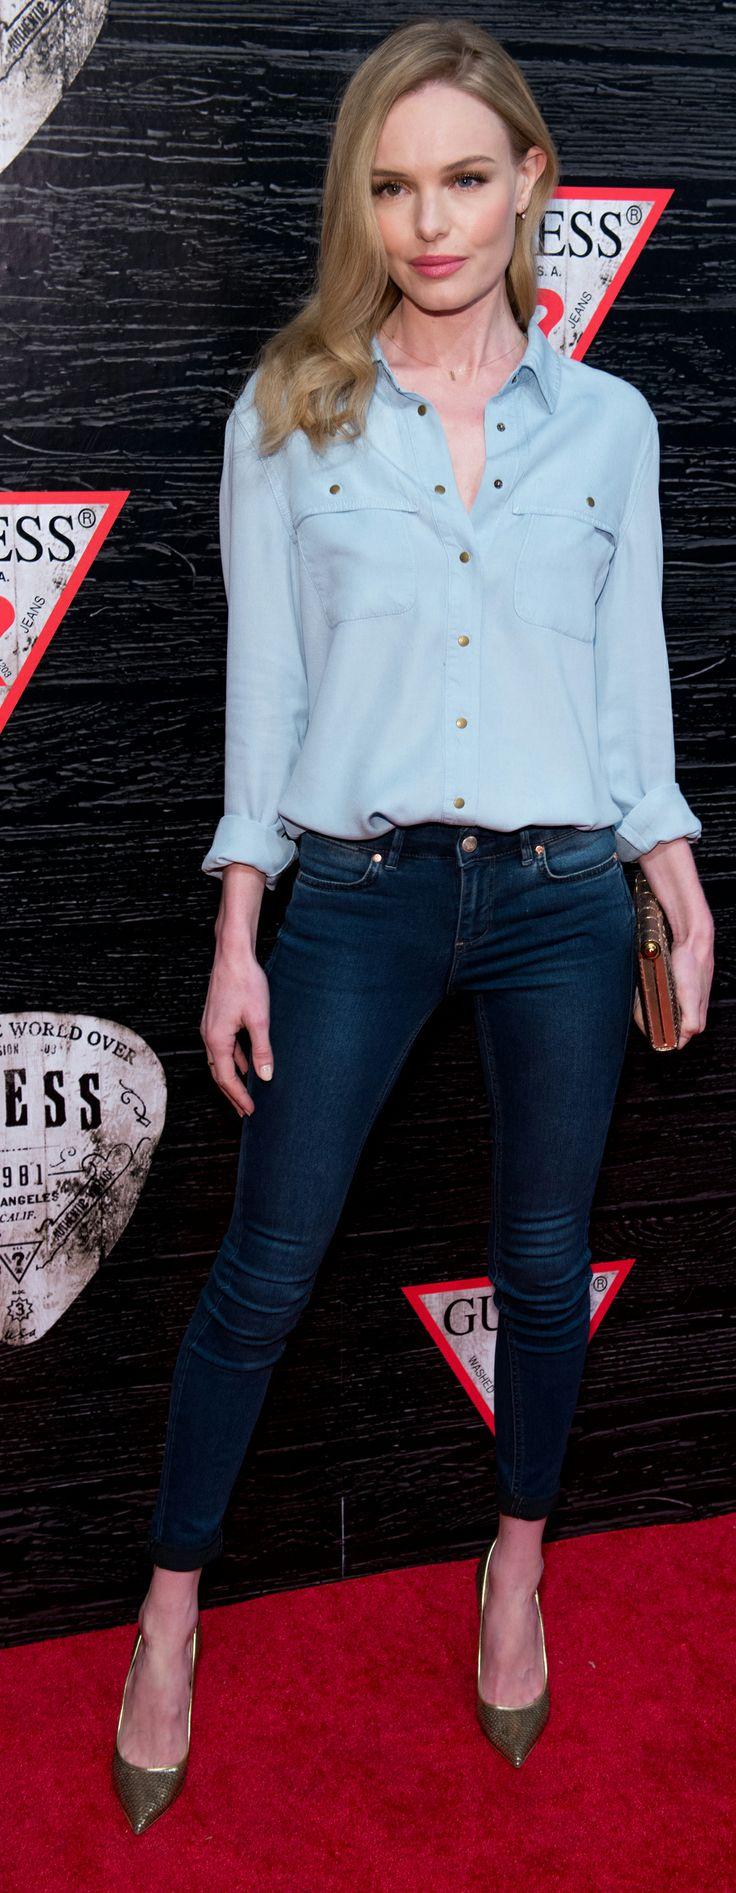 Copy Kate Bosworth's denim-on-denim look starting at just $22!